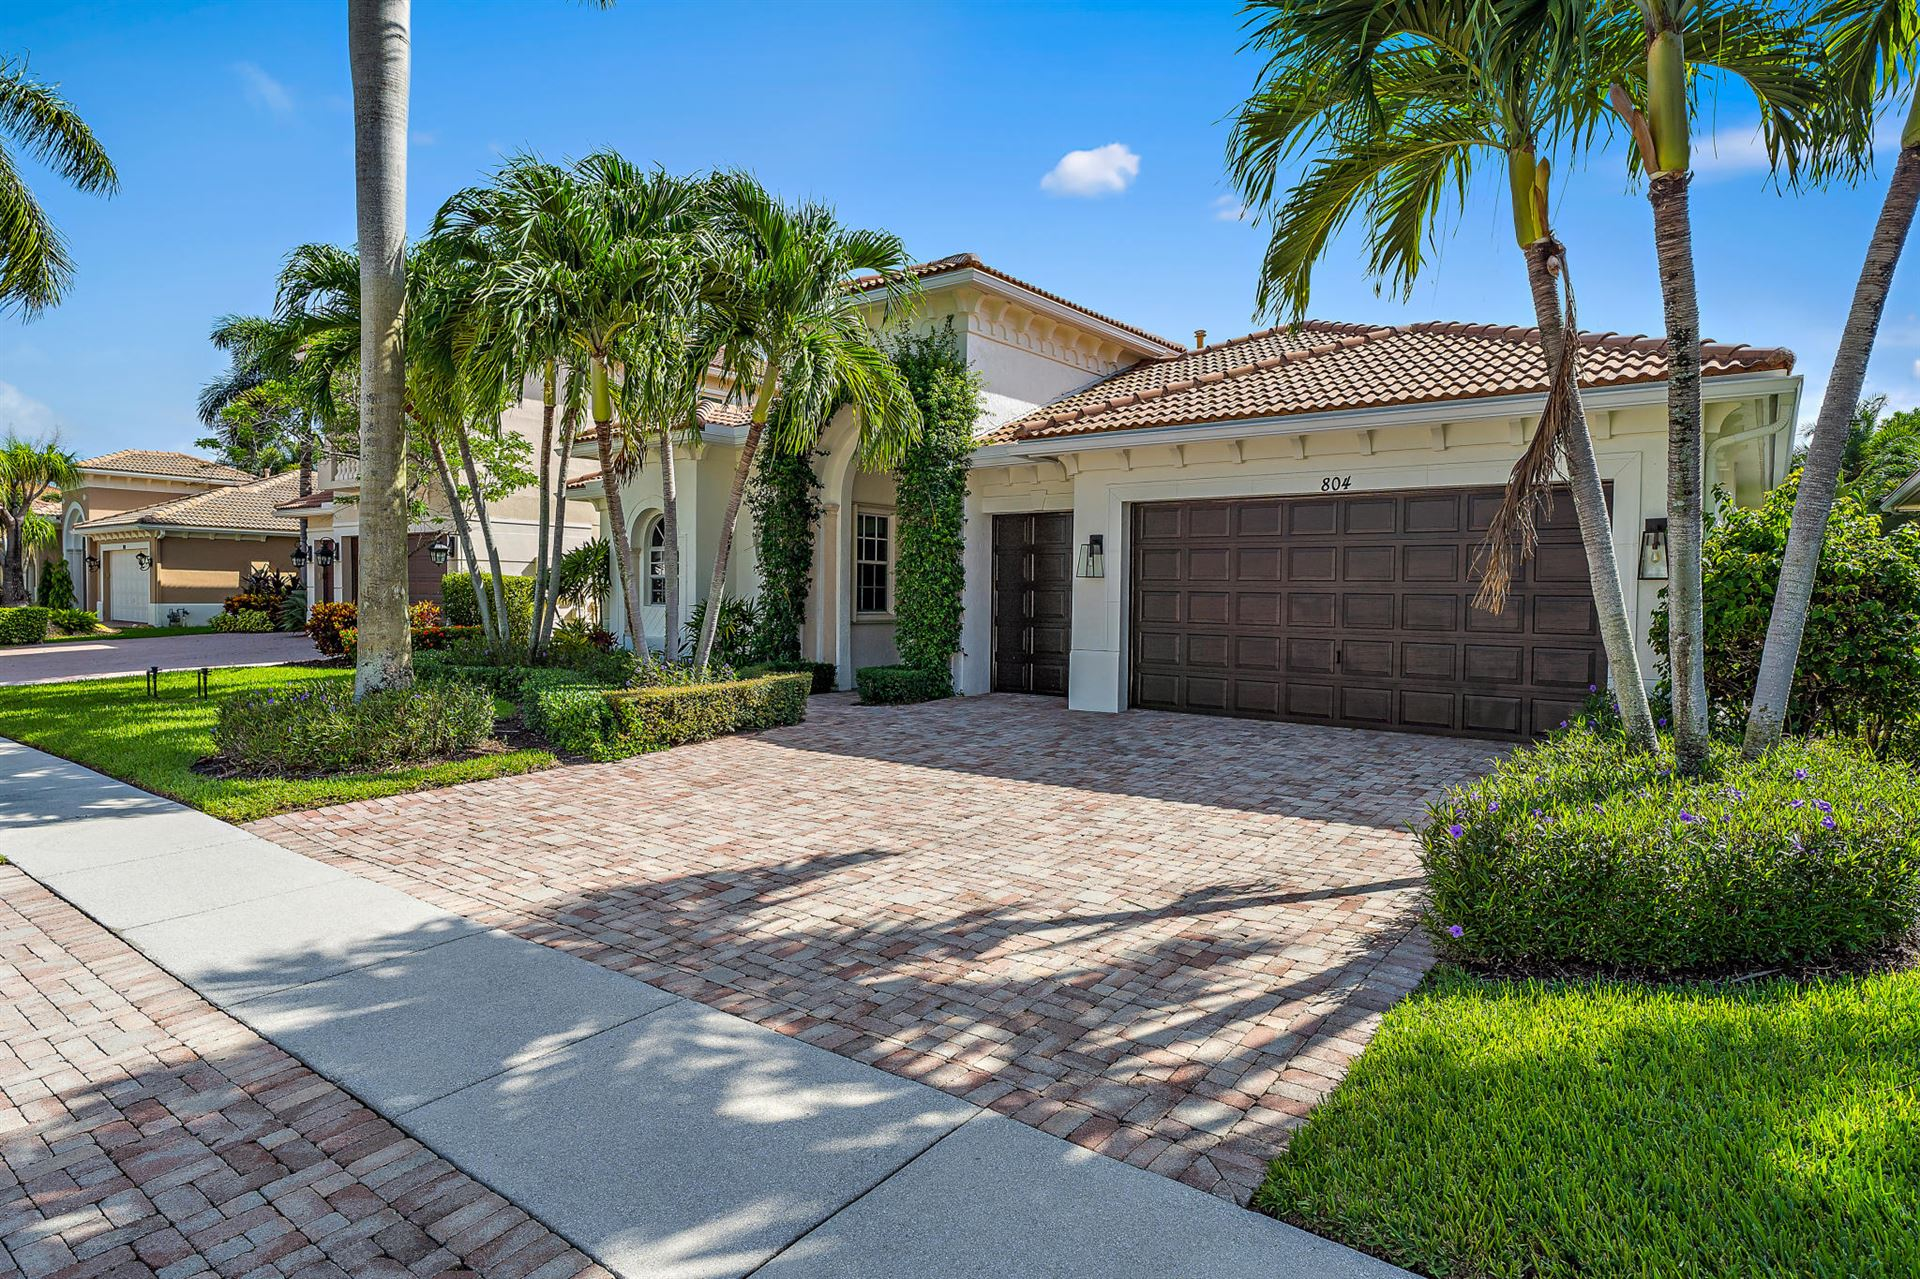 Photo of 804 Floret Drive, Palm Beach Gardens, FL 33410 (MLS # RX-10650420)